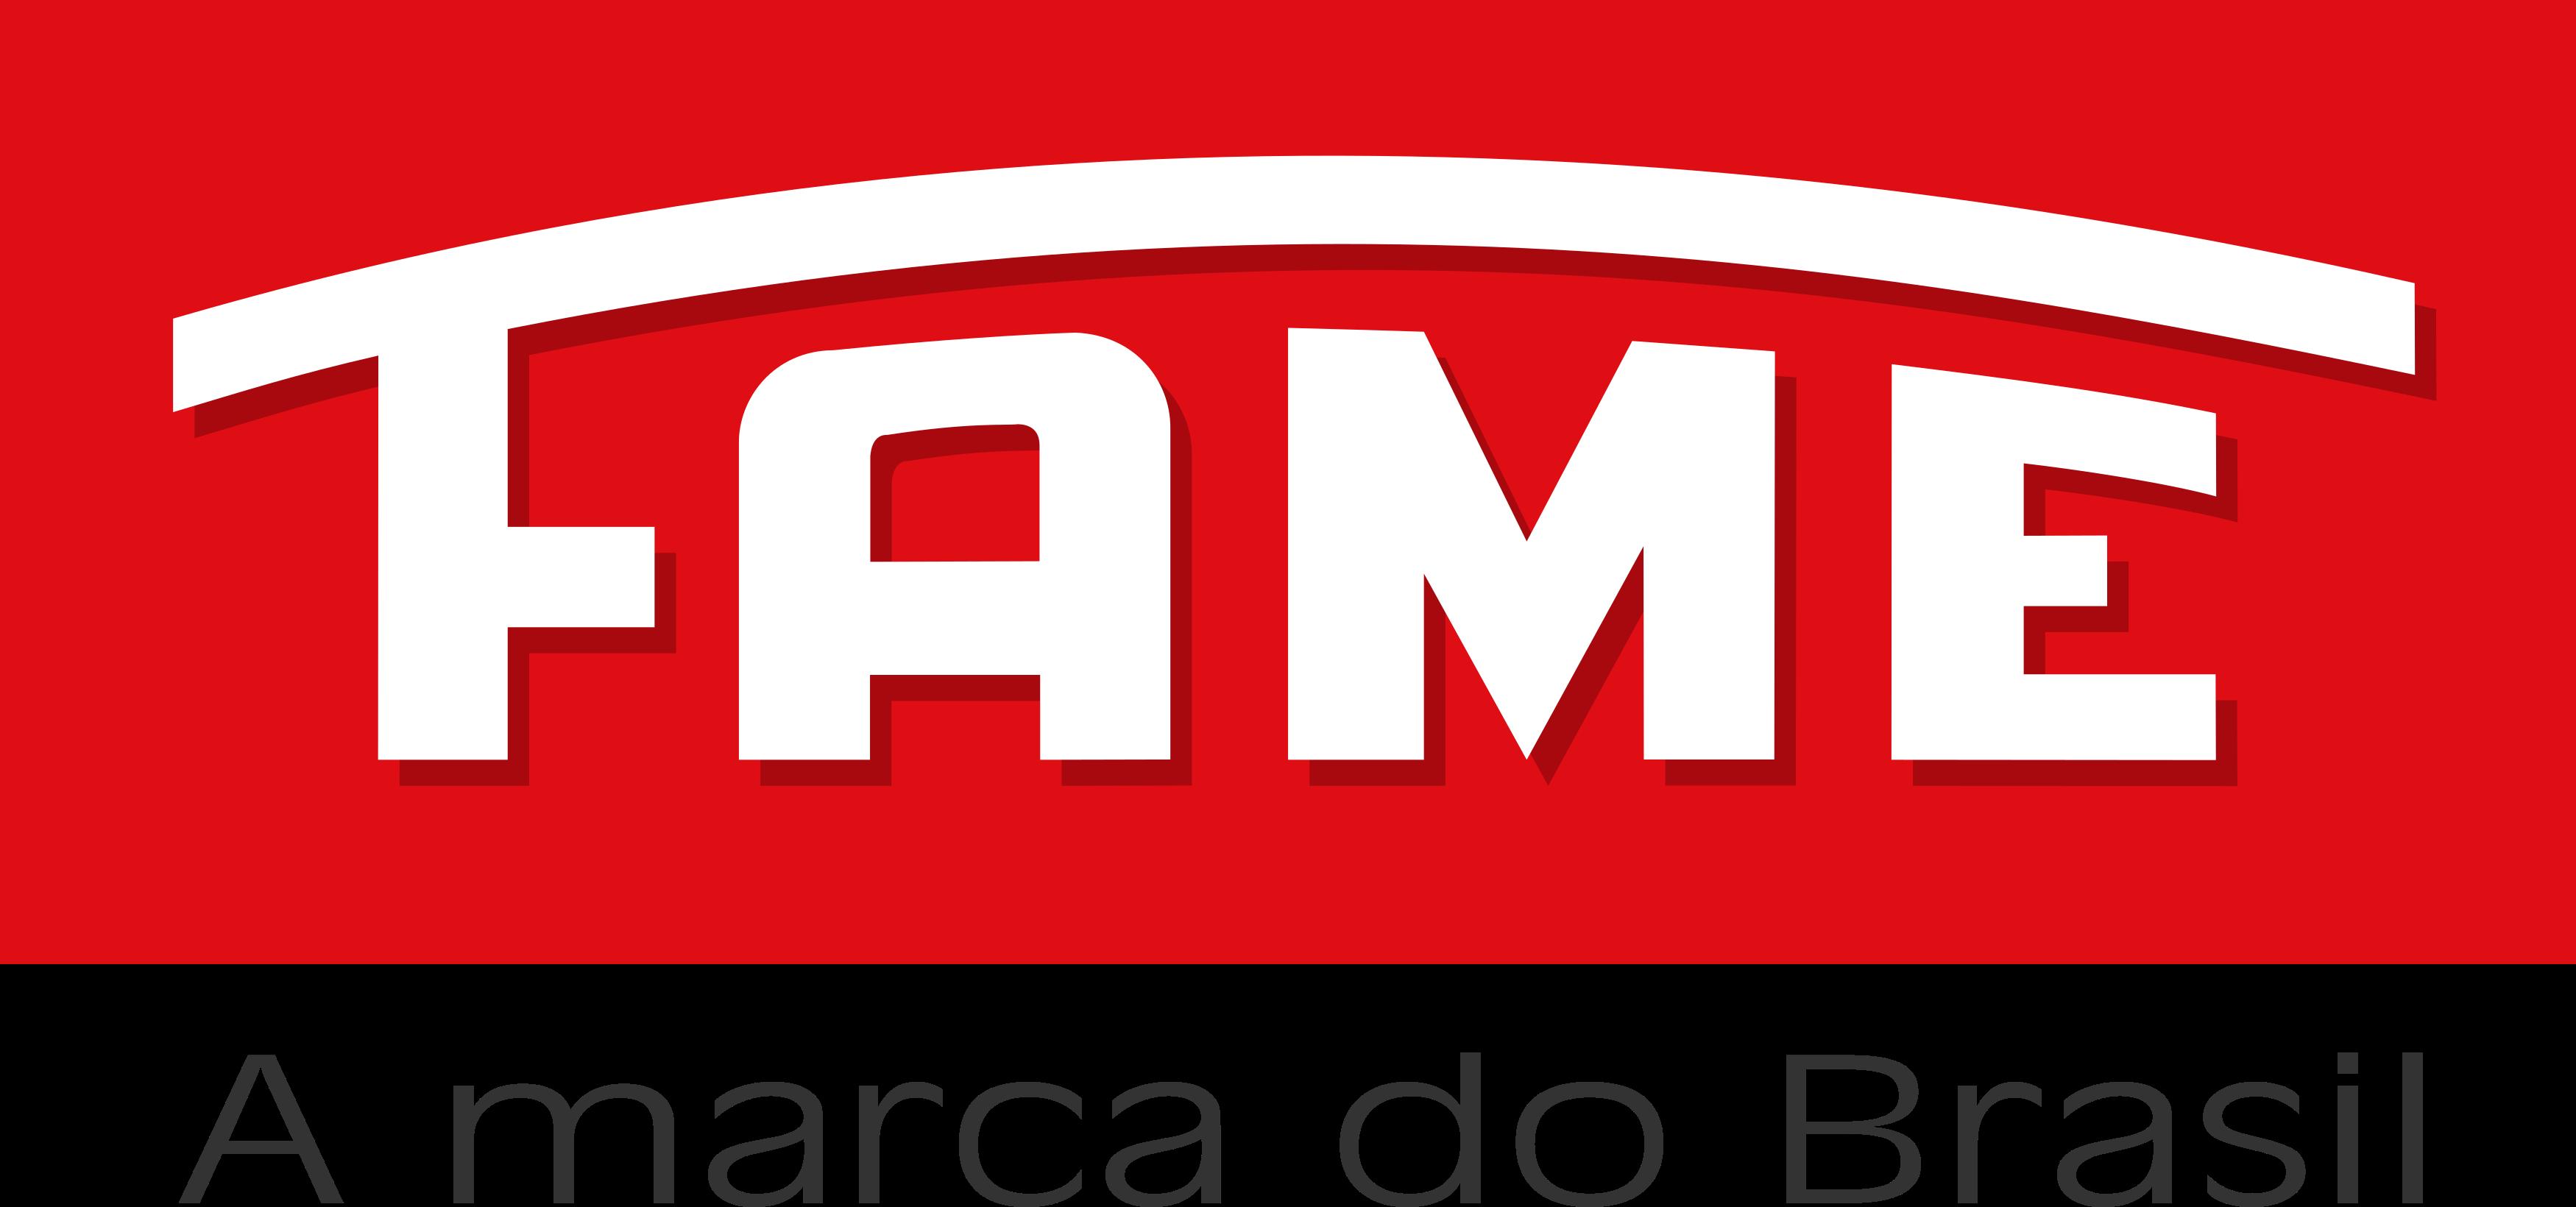 gew nrw logo 5525852 academiasalamancainfo